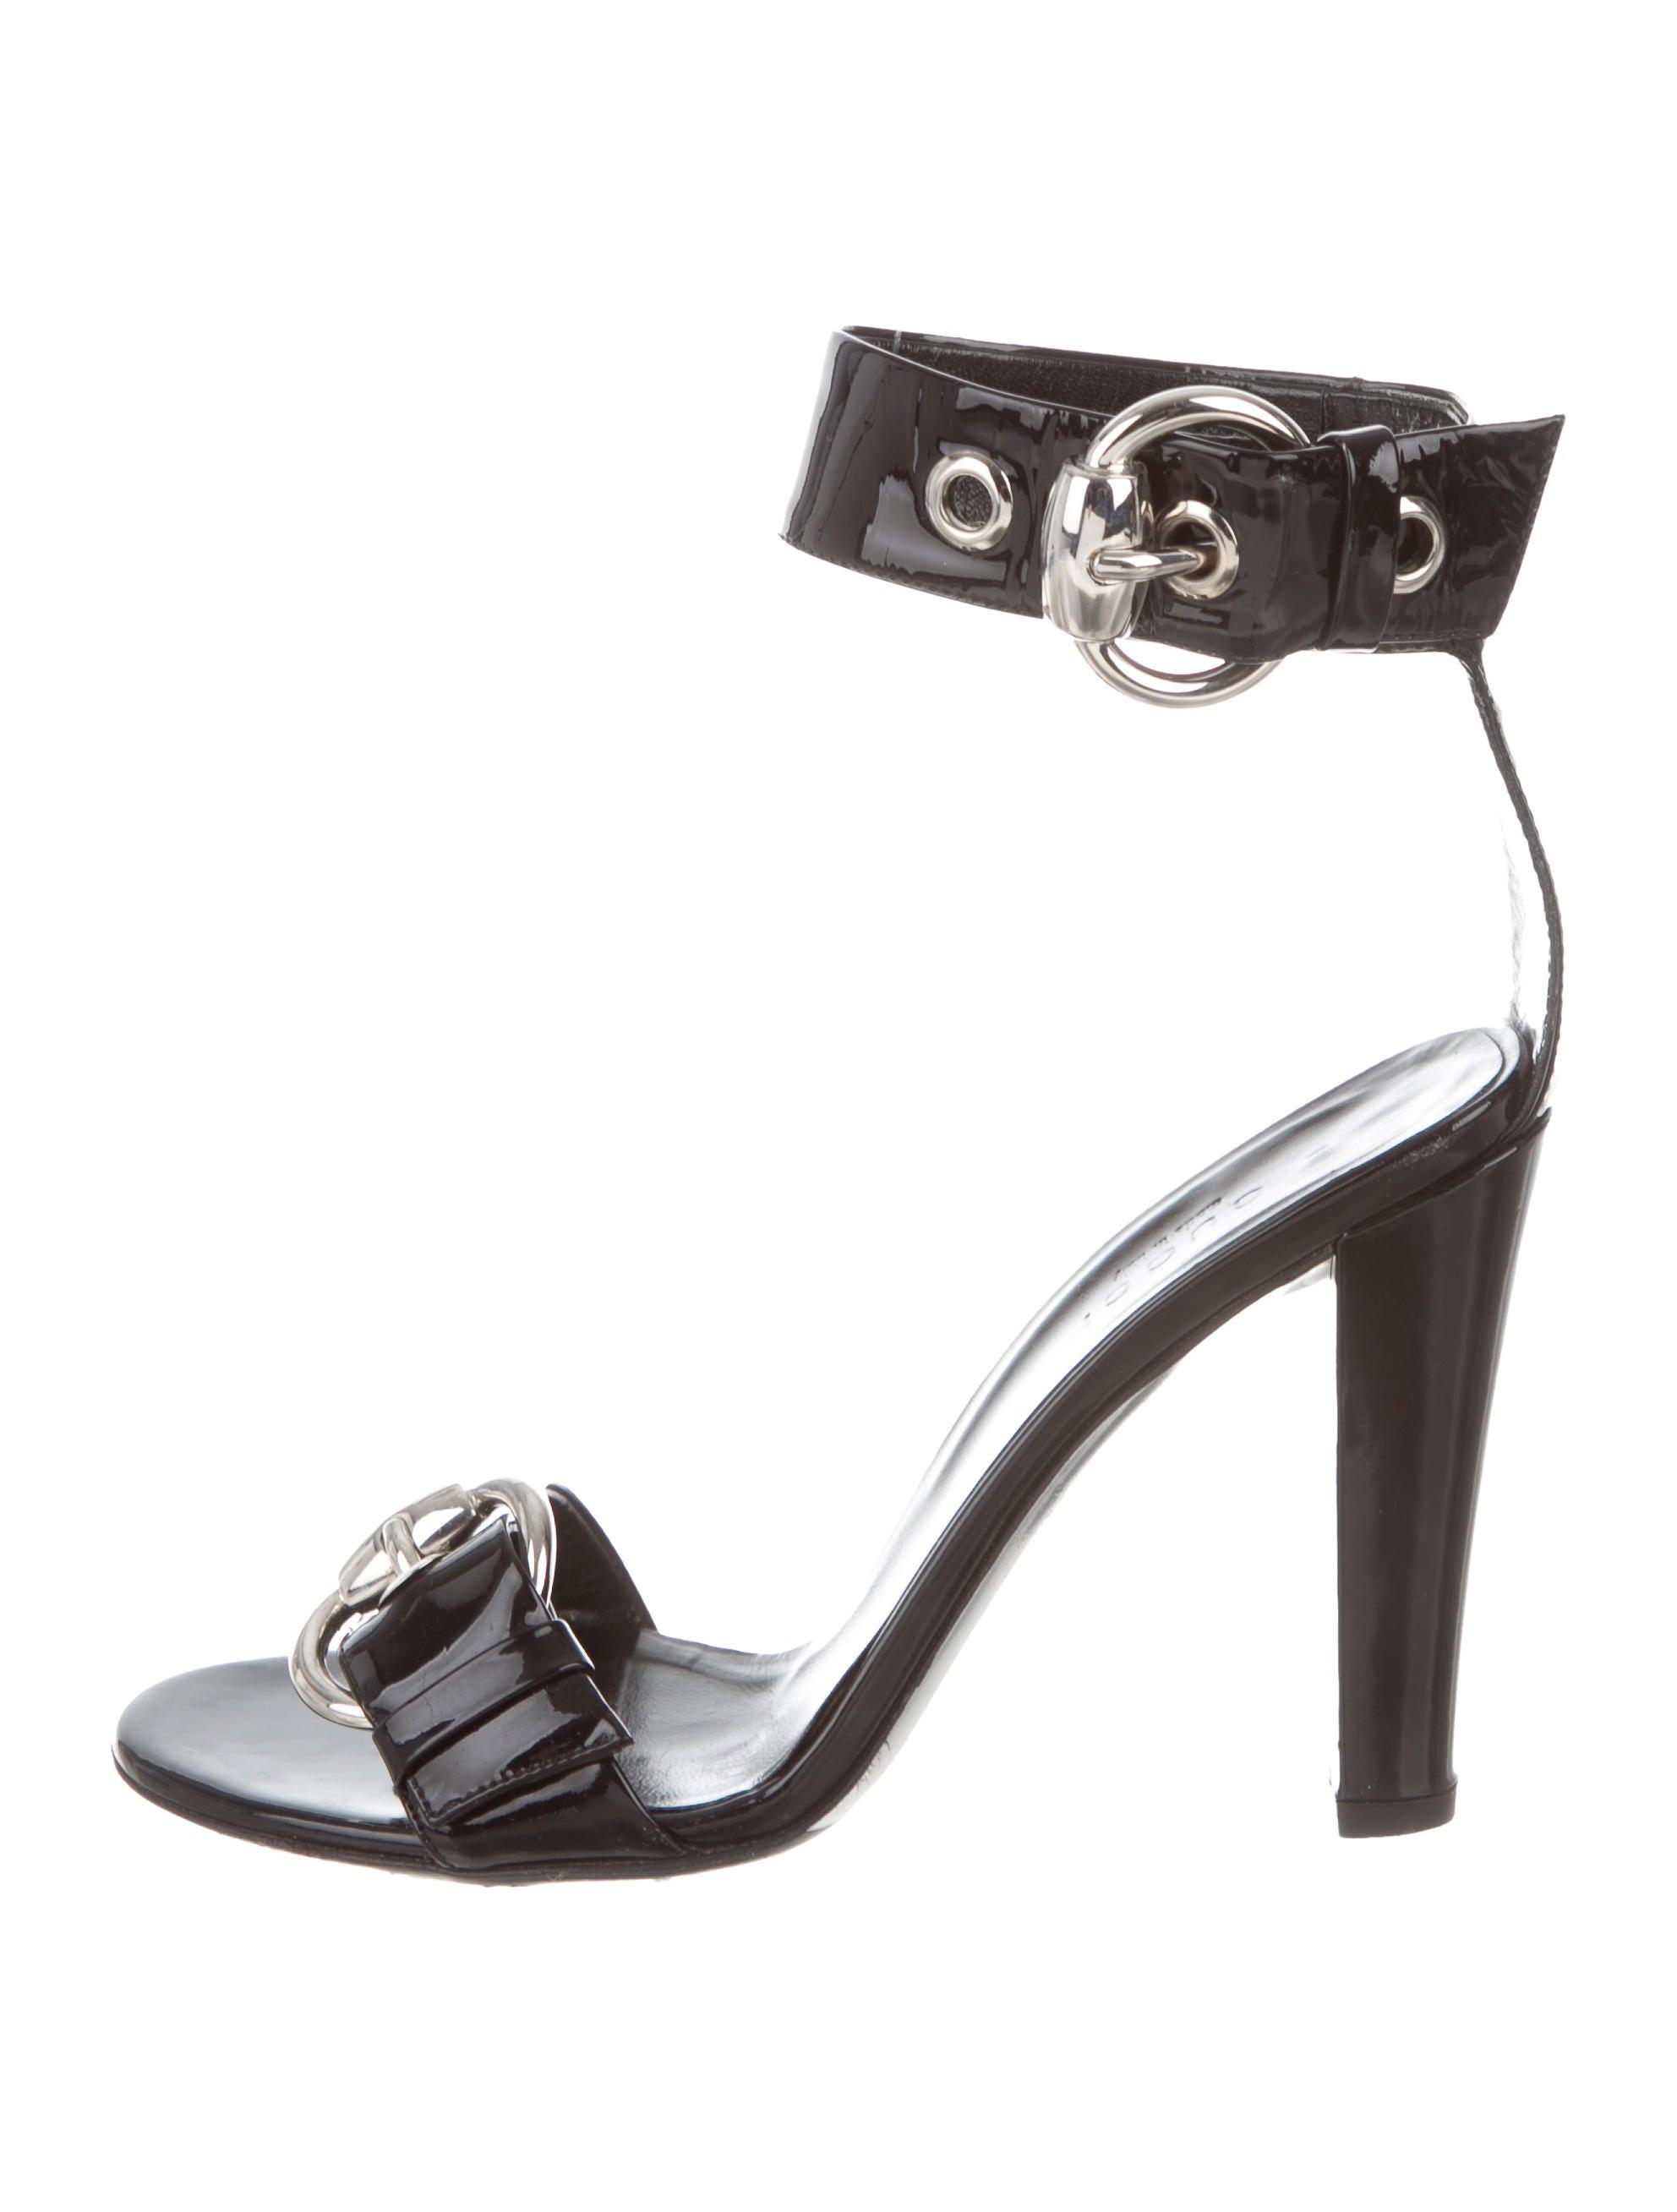 e99da3c3cd35 Gucci Patent Leather Ankle-Strap Sandals - Shoes - GUC304252